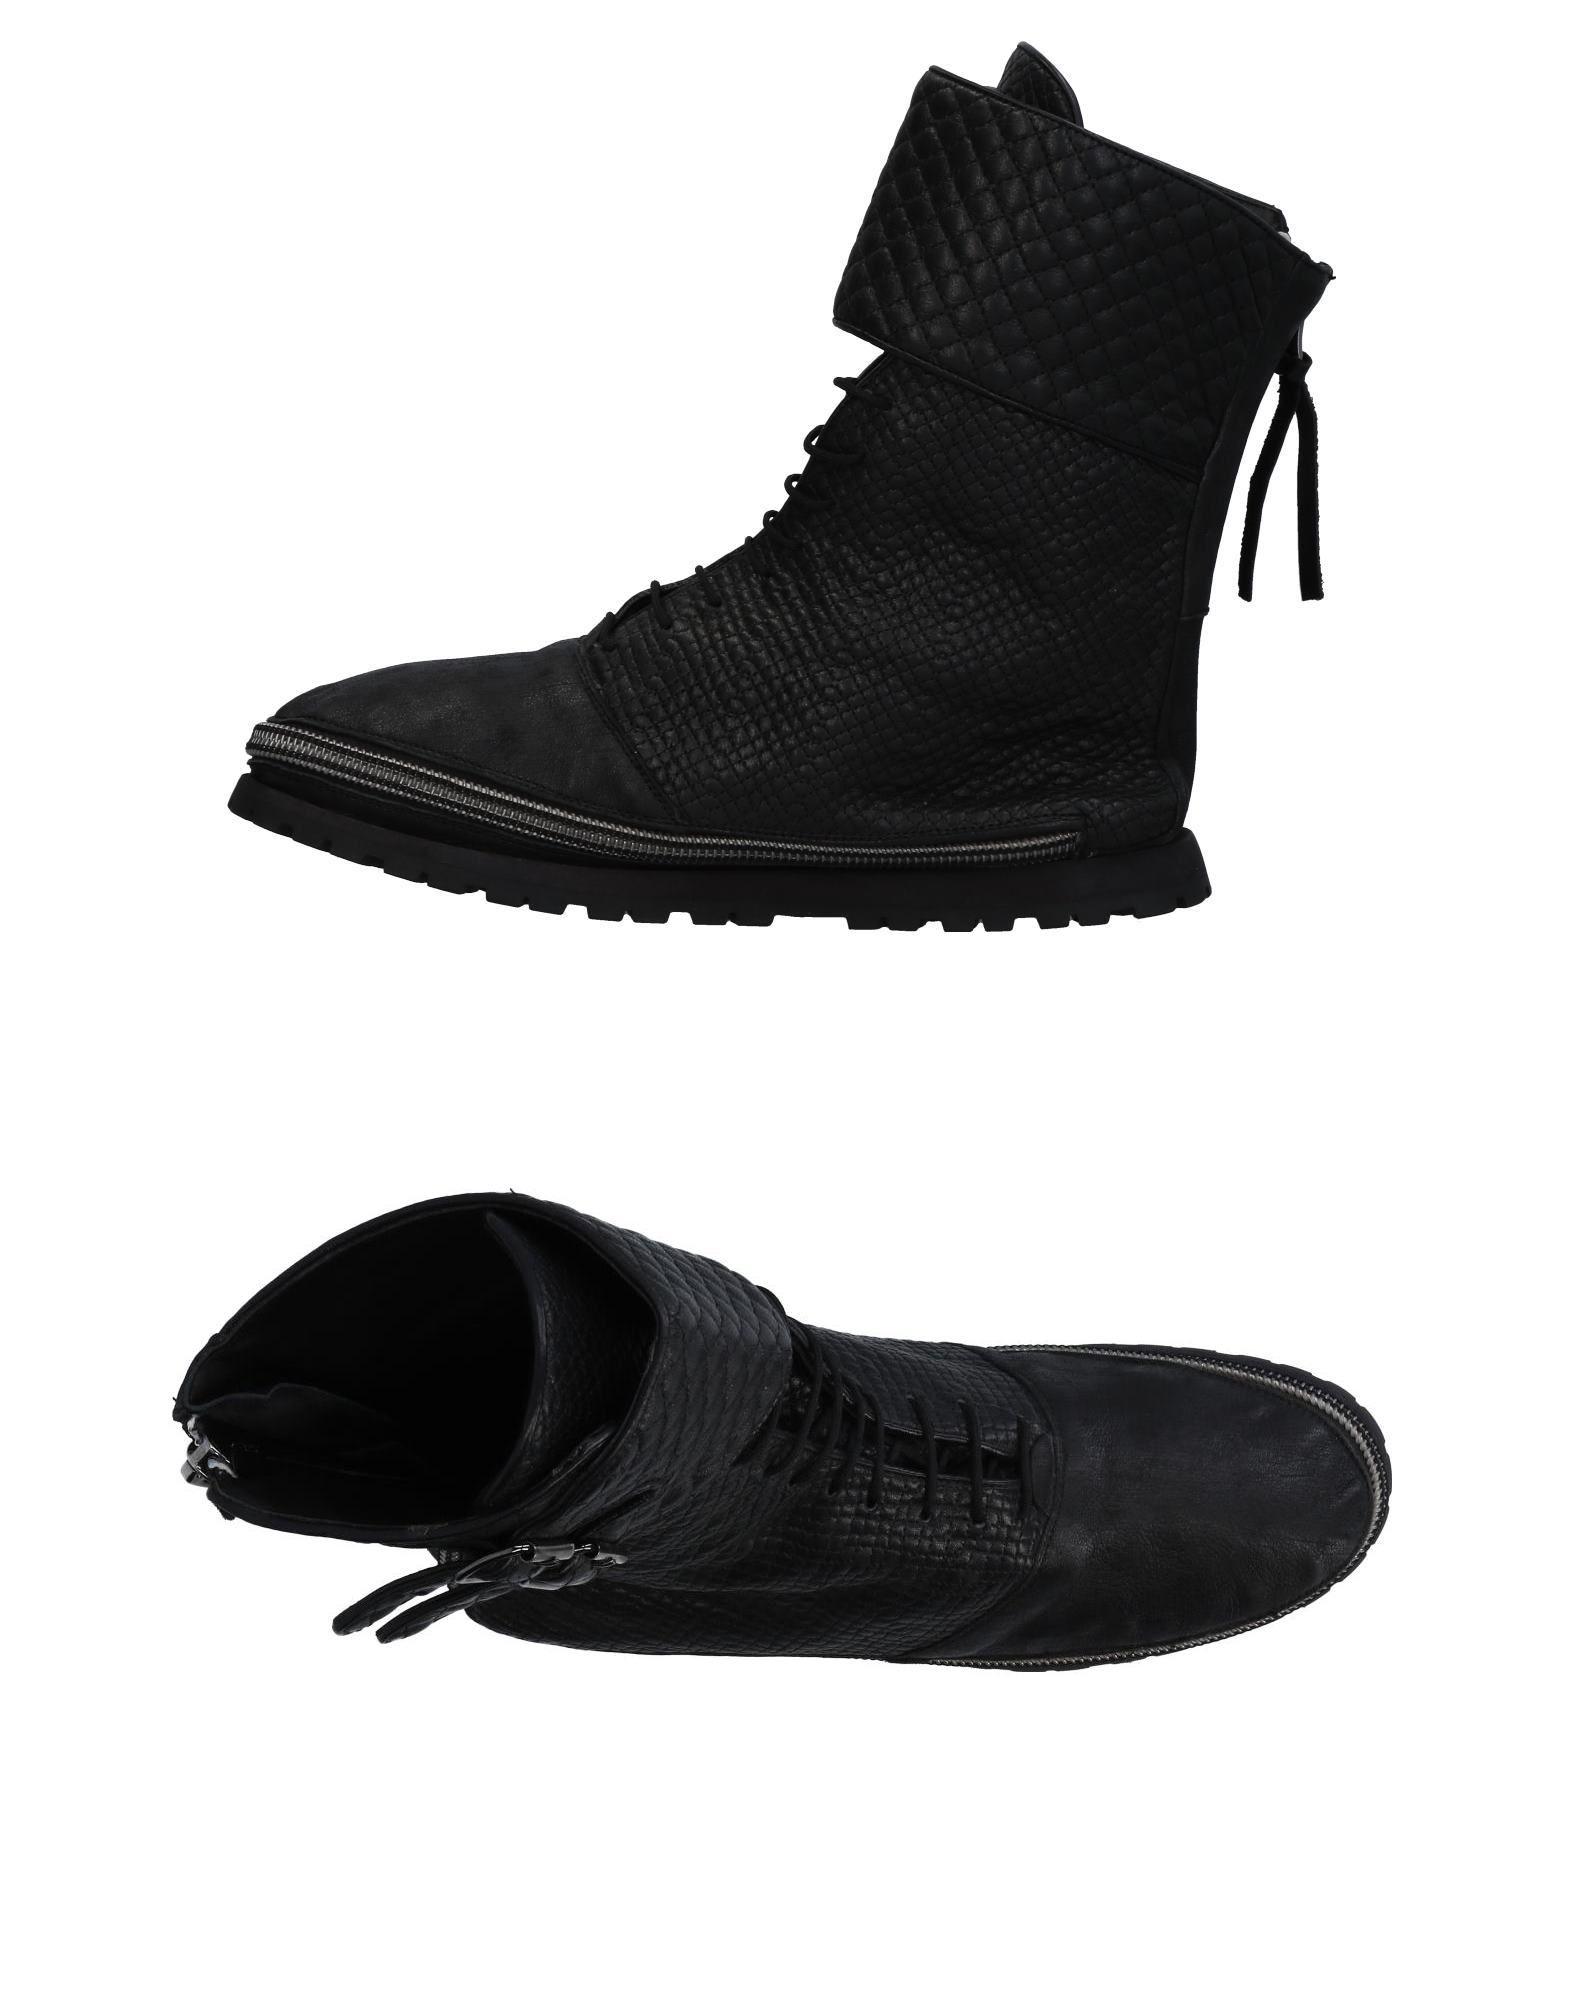 Sneakers Giorgio Brato + Veeshoo Homme - Sneakers Giorgio Brato + Veeshoo  Noir Spécial temps limité